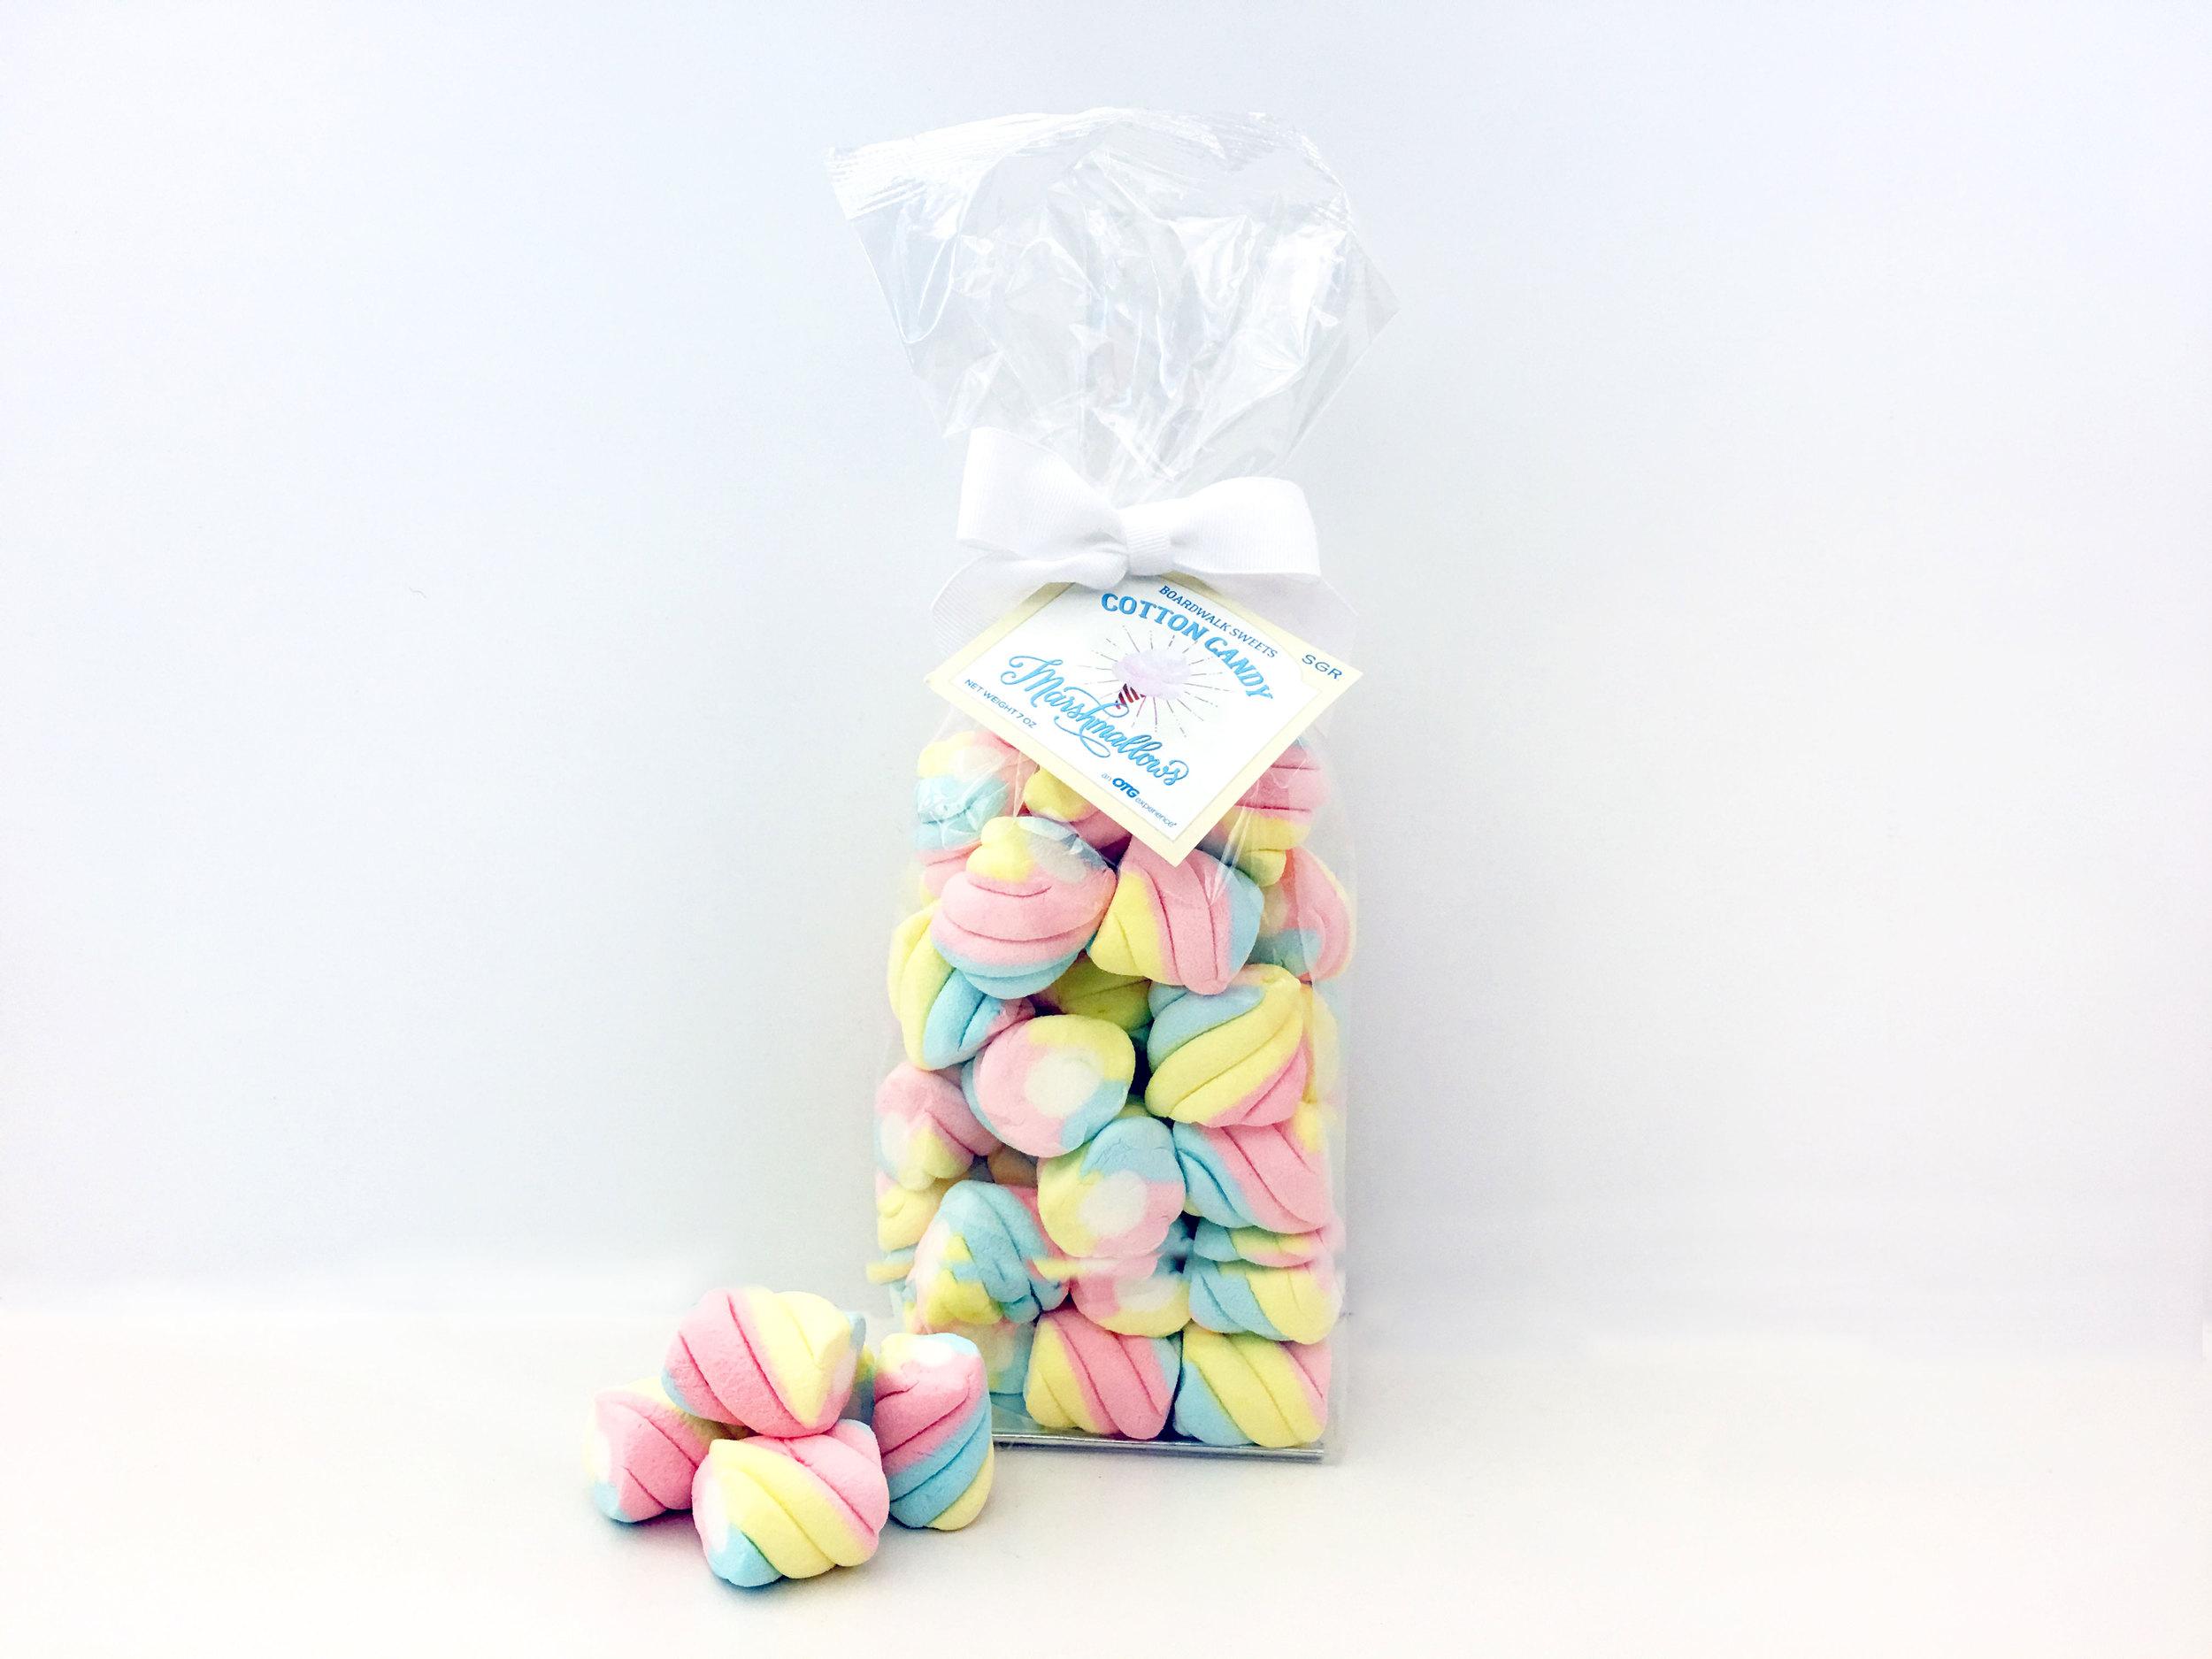 marshmallow.notext.jpg